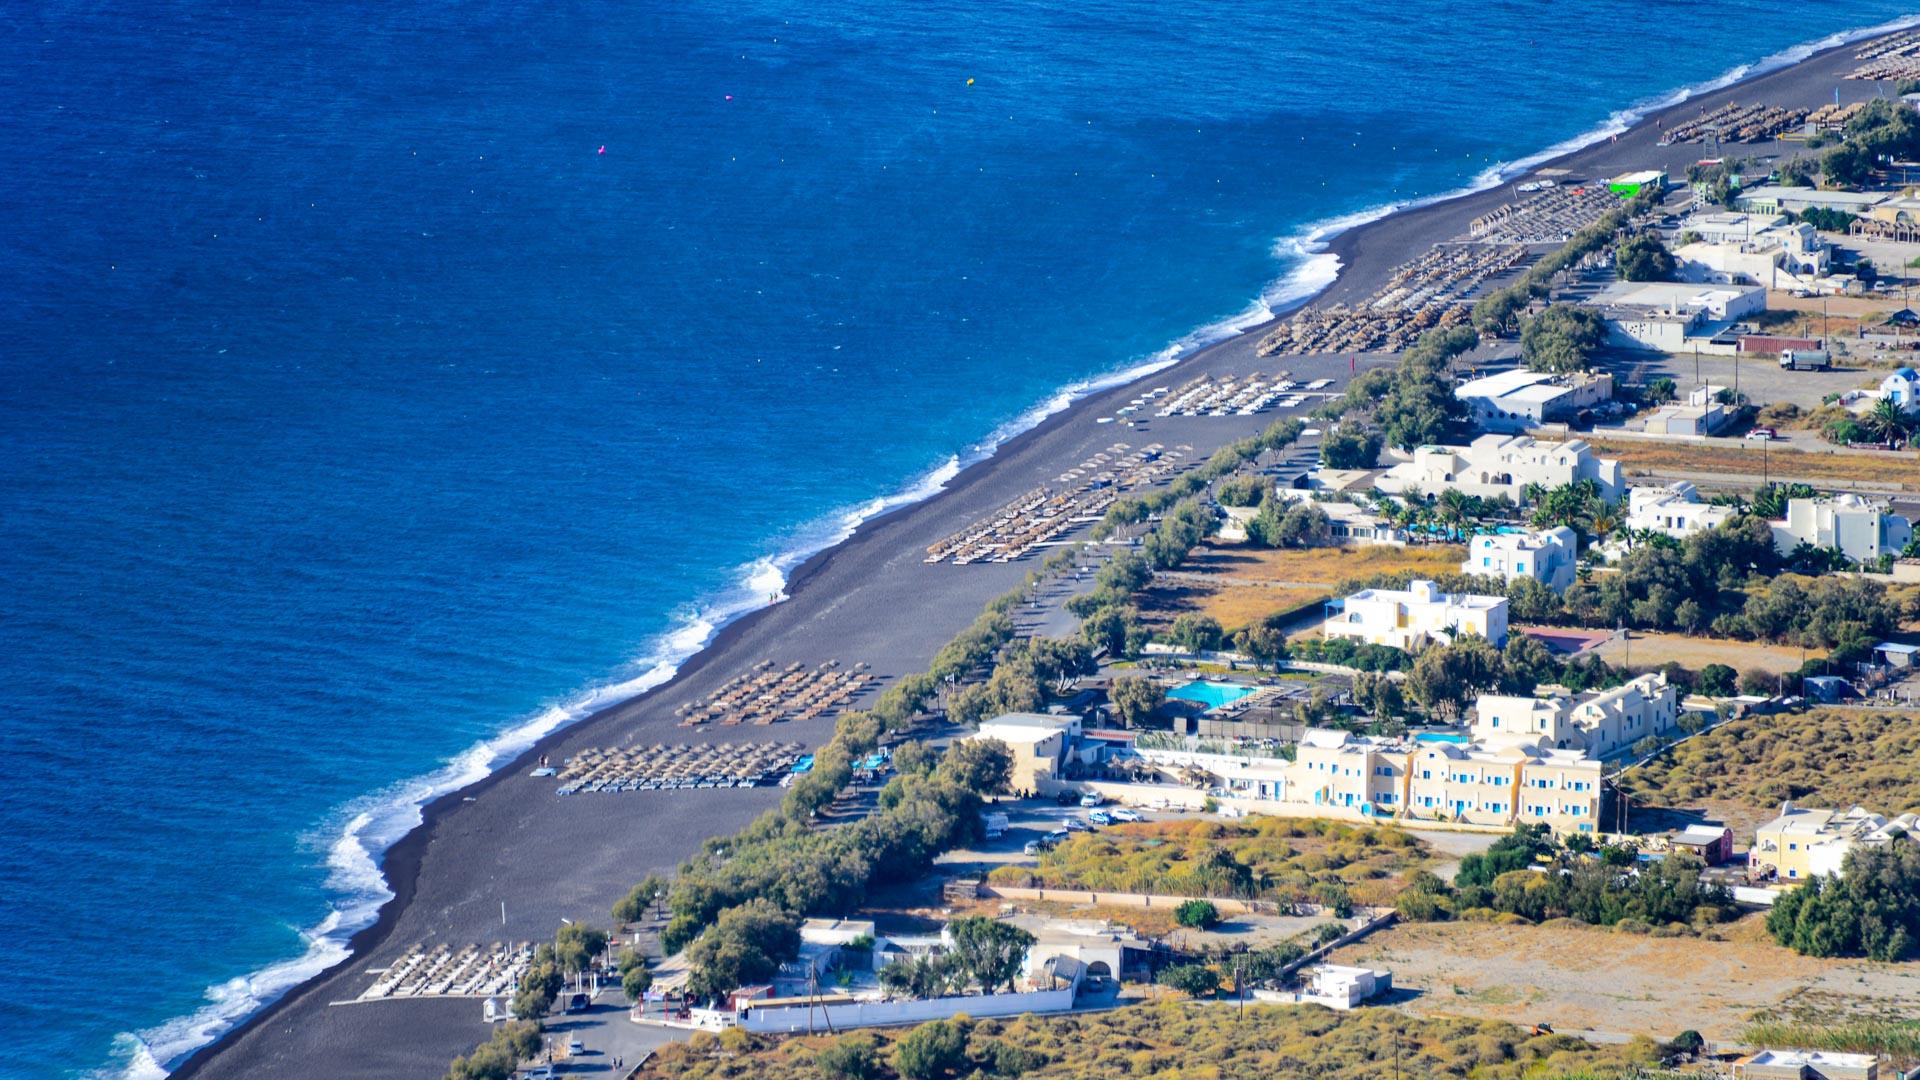 Bird's-eye view of Perivolos Beach